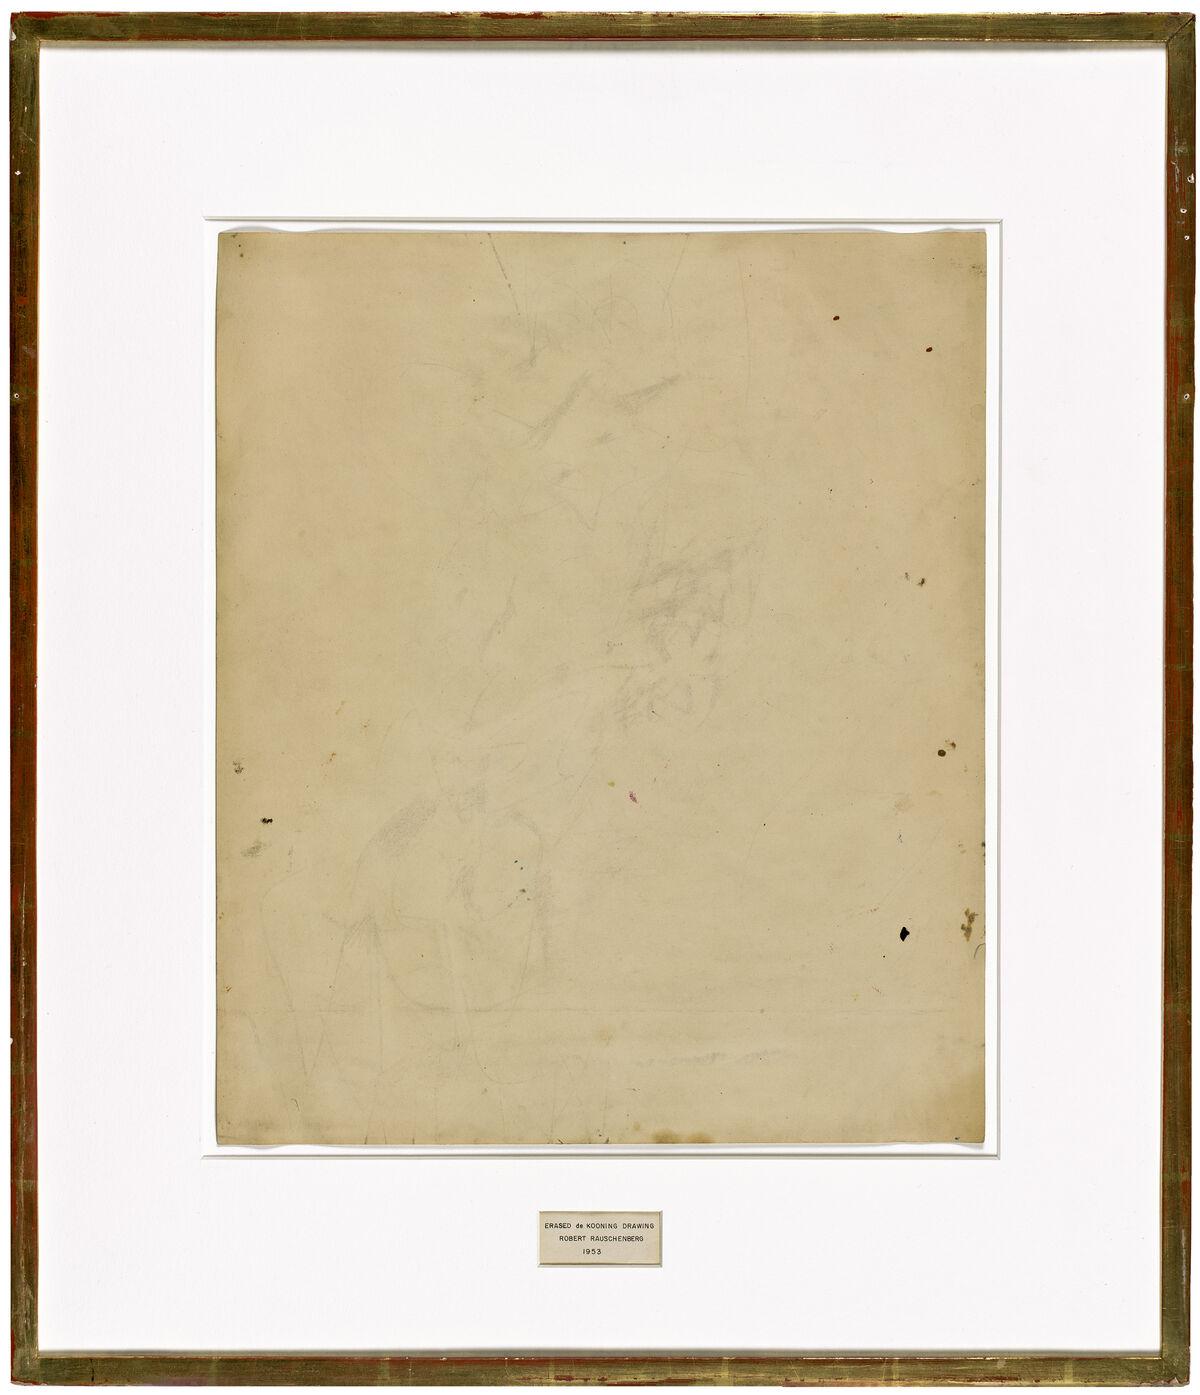 Robert Rauschenberg with Willem de Kooning and Jasper Johns, Erased de Kooning Drawing, 1953. Photo by Ben Blackwell. © 2017 Robert Rauschenberg Foundation, courtesy of the Museum of Modern Art.